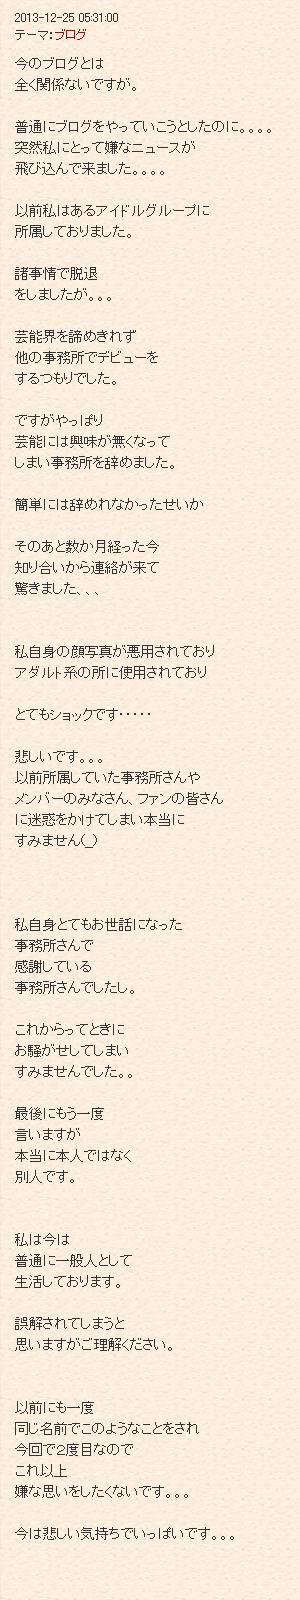 135-麻友美